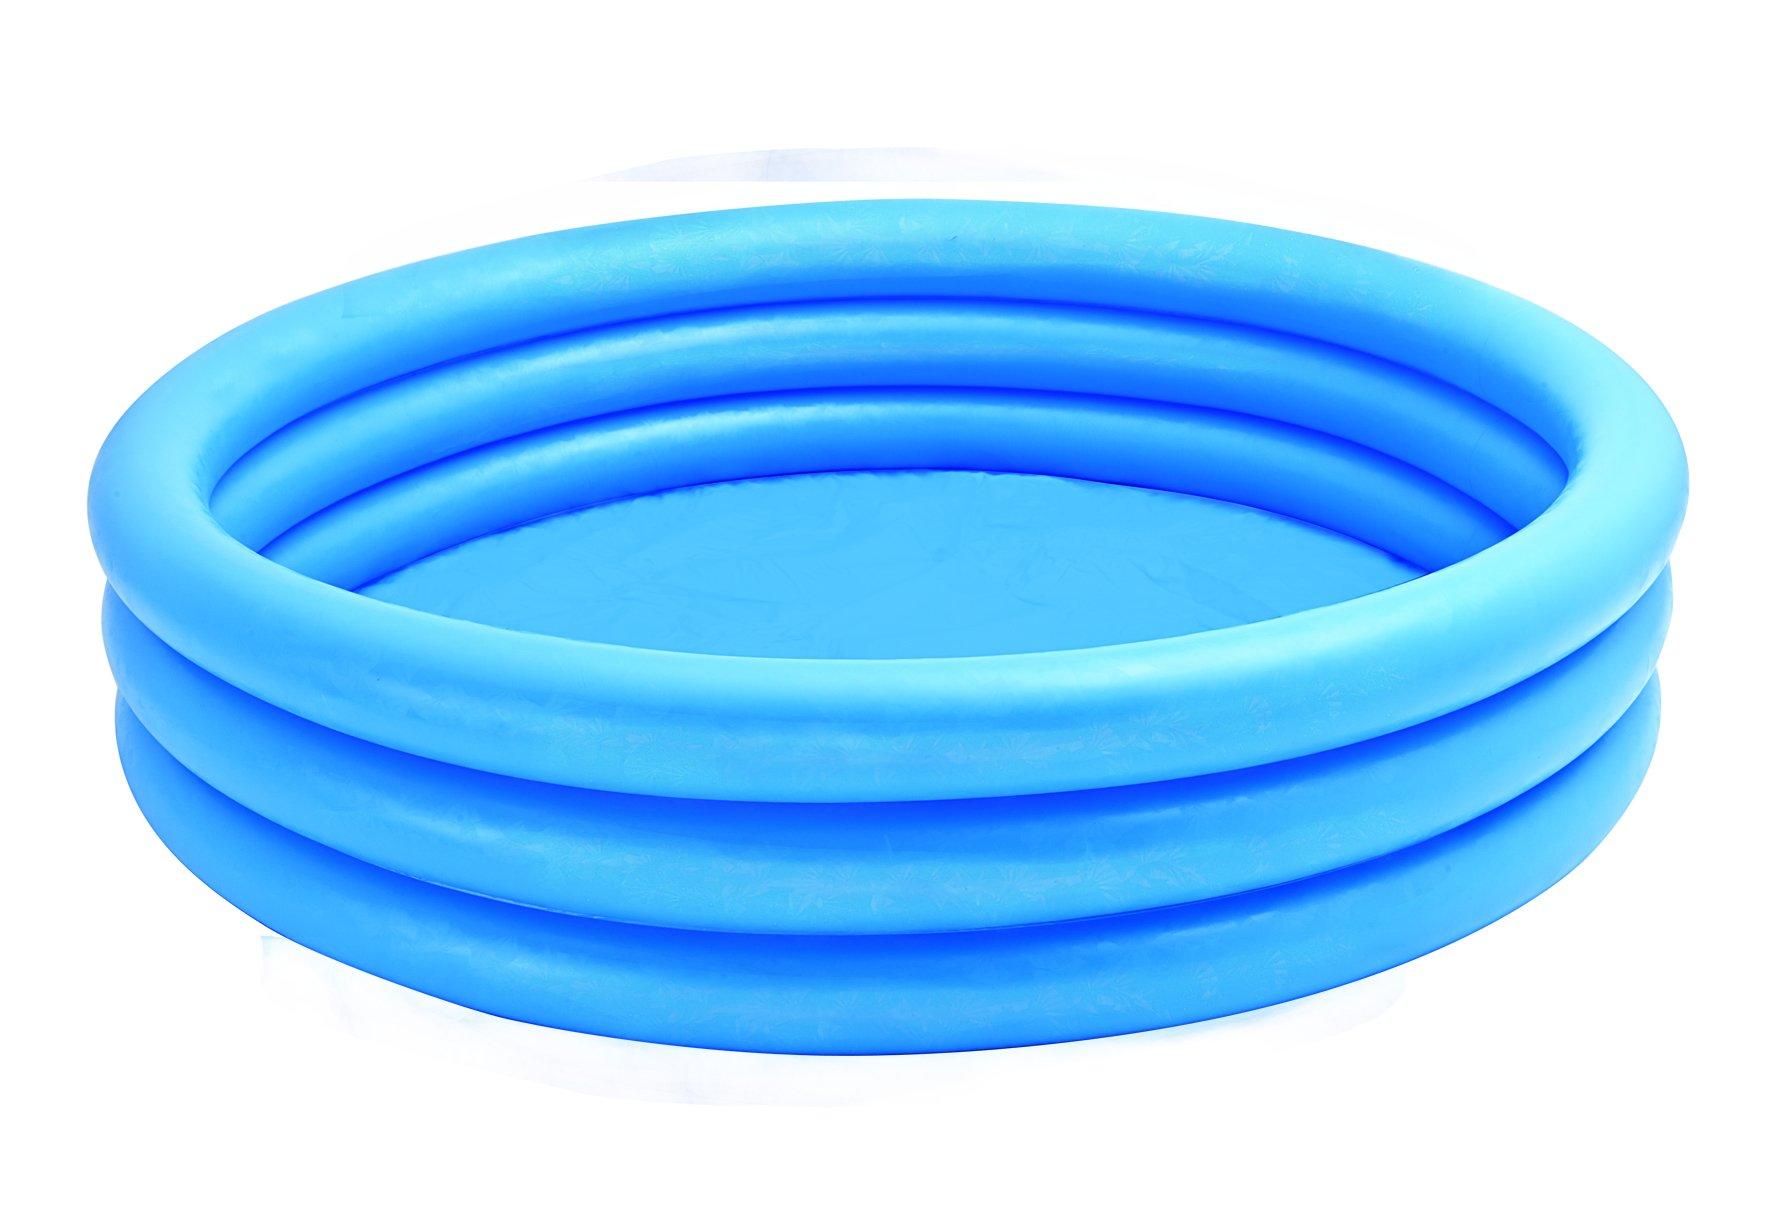 Intex Recreation 58426EP Crystal Blue Pool by Intex